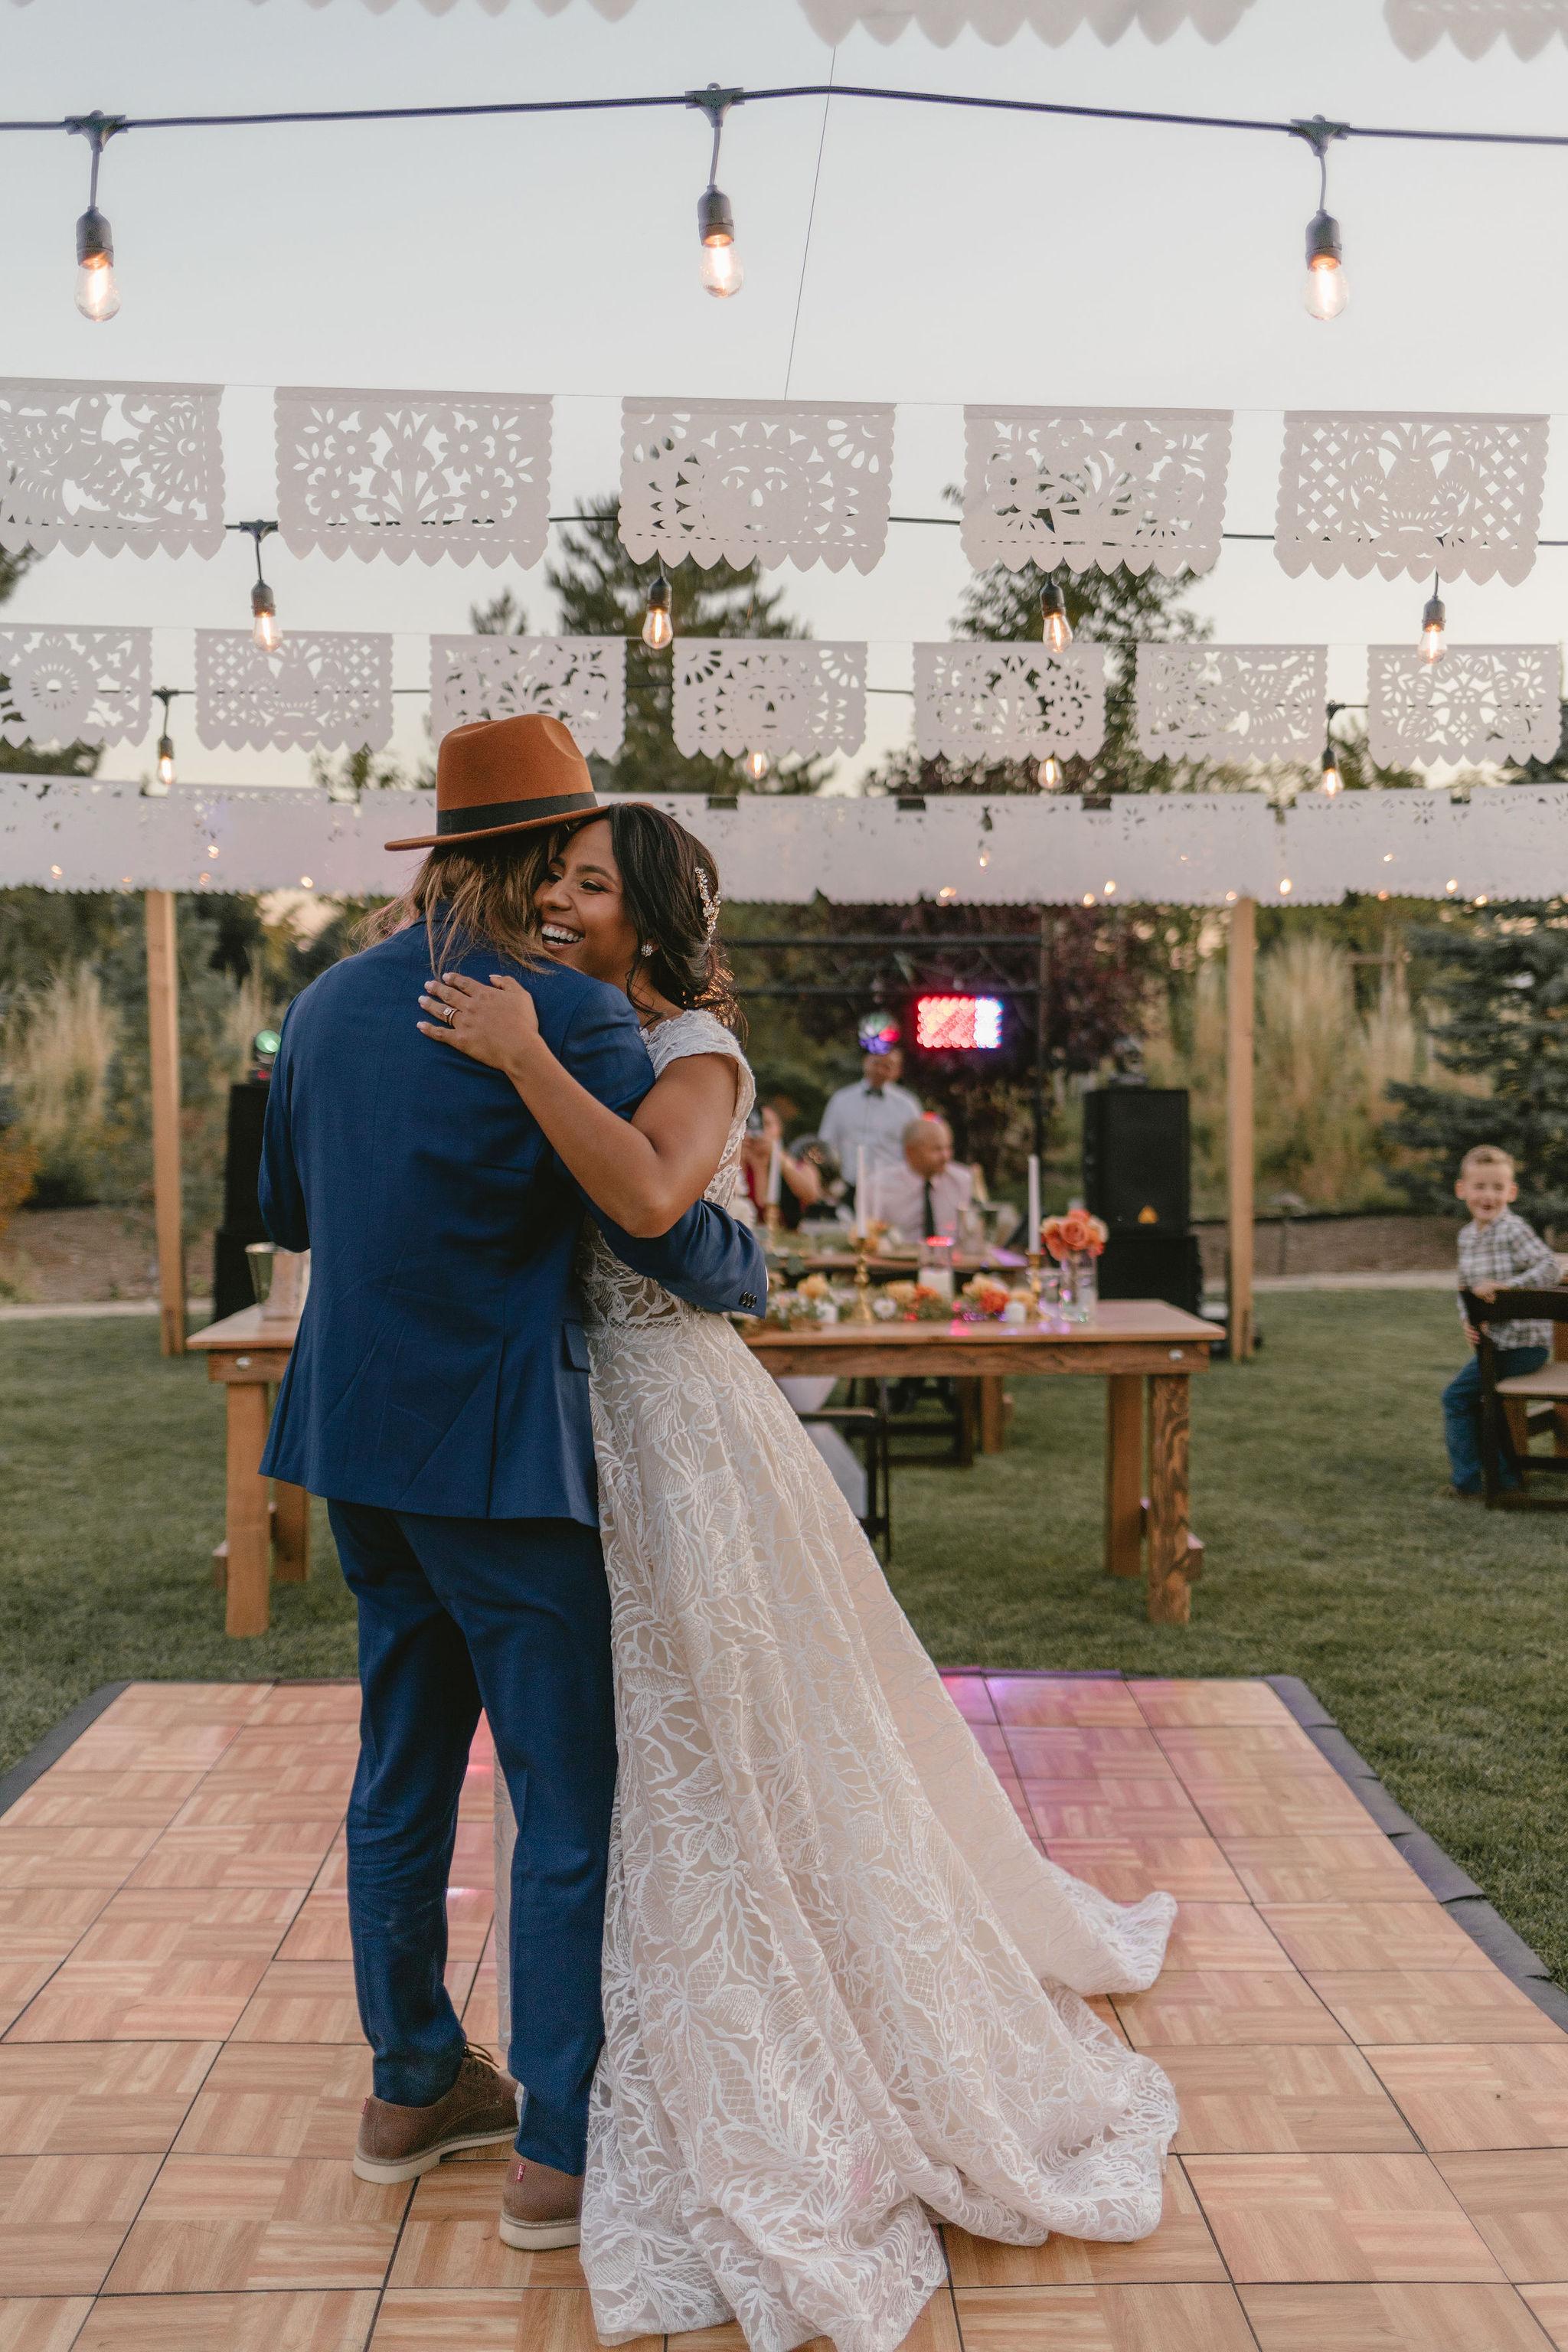 Papel Picado Wedding Banners Eco Friendly Backyard Summer Wedding Princess Kaiulani Tabernero 4